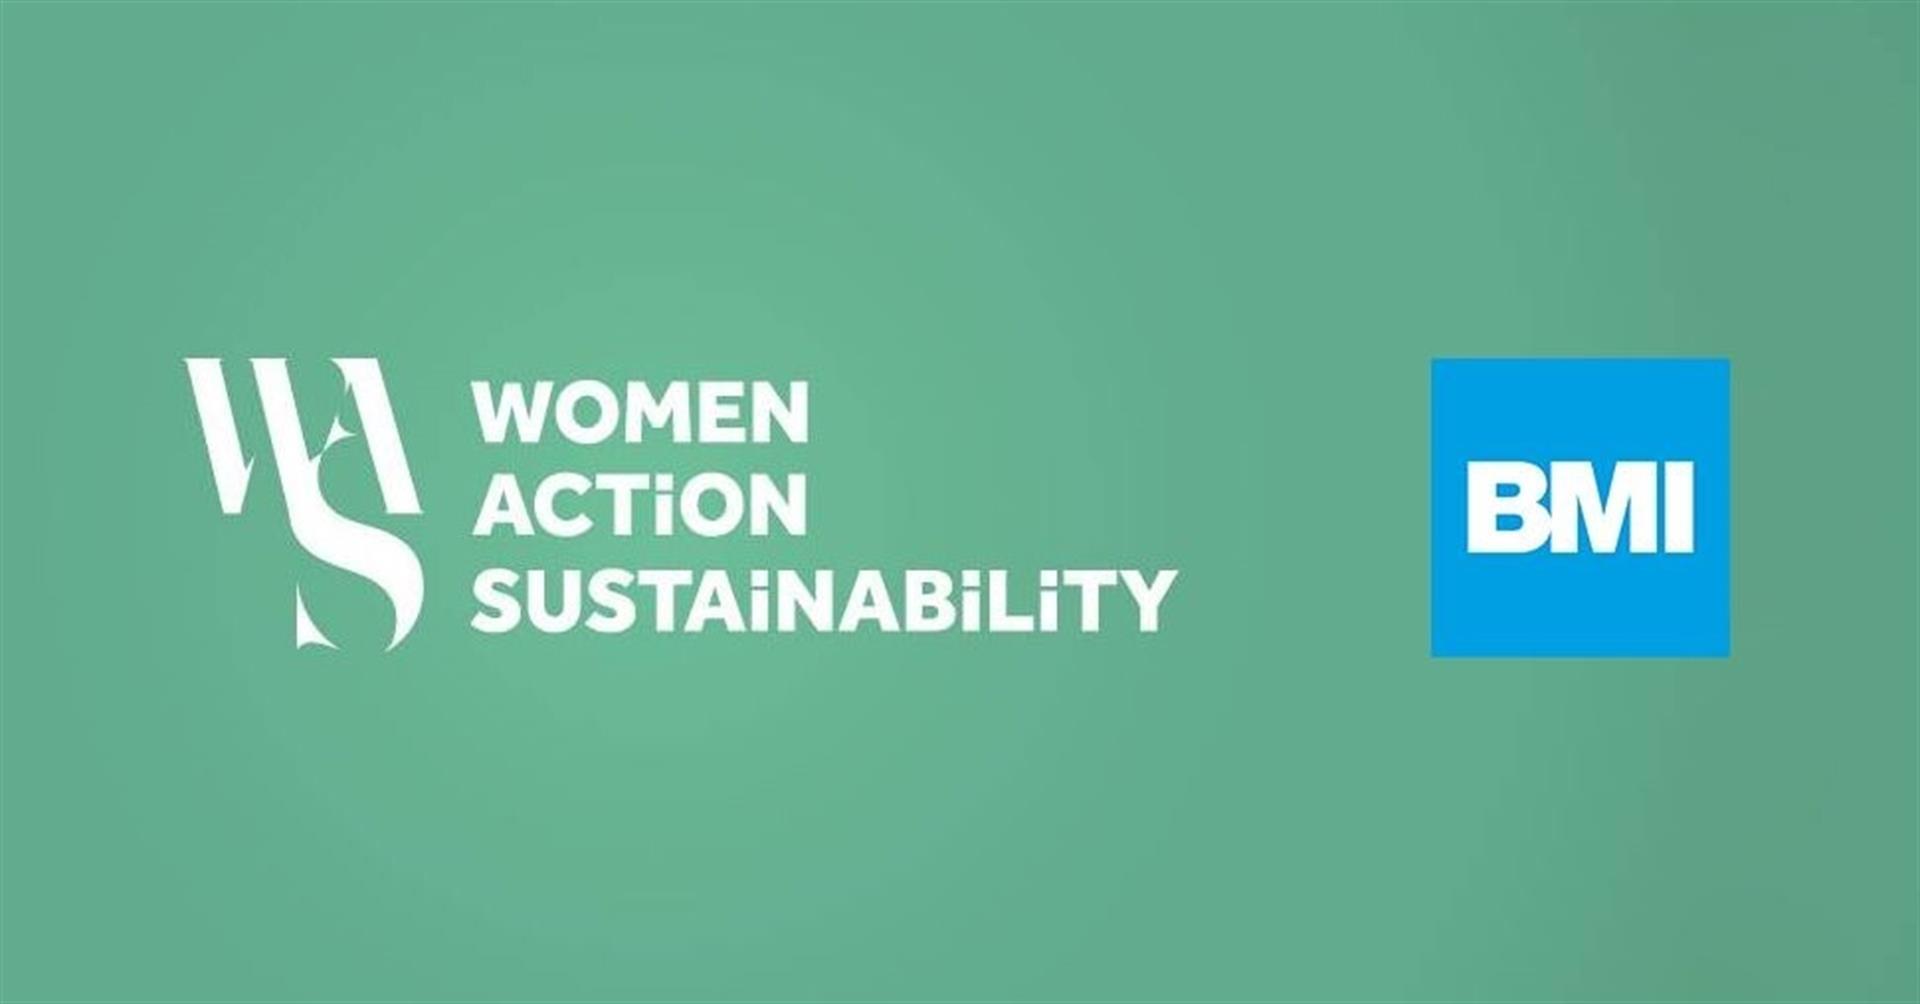 BMI Women Action Sustainability